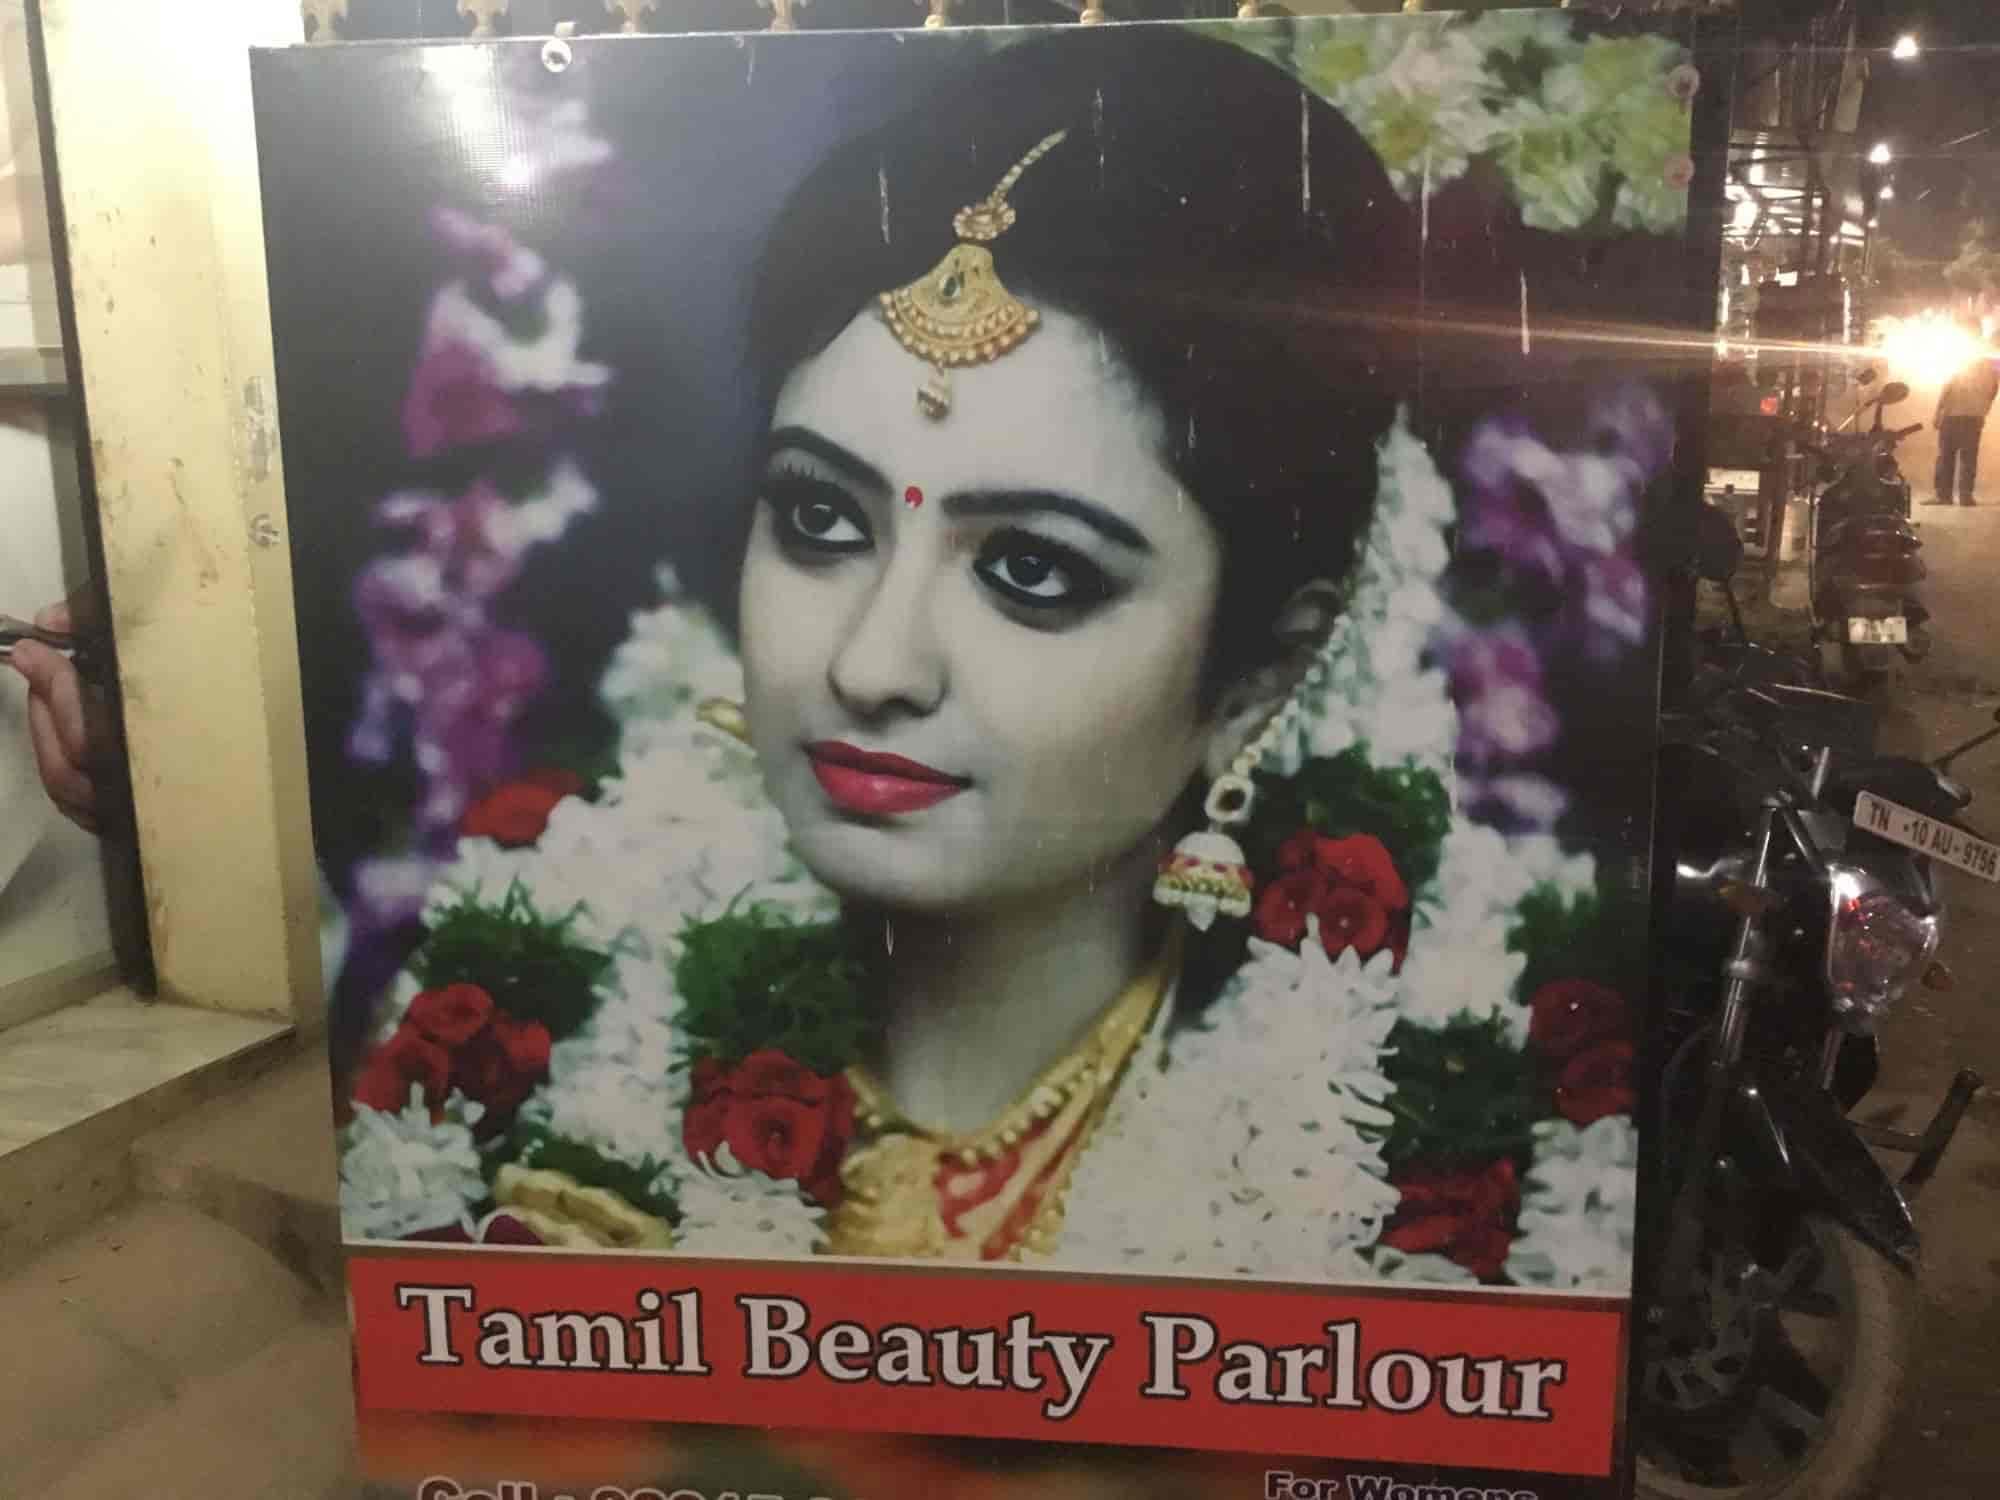 Tamil Beauty Spa Photos, Valasaravakkam, Chennai- Pictures